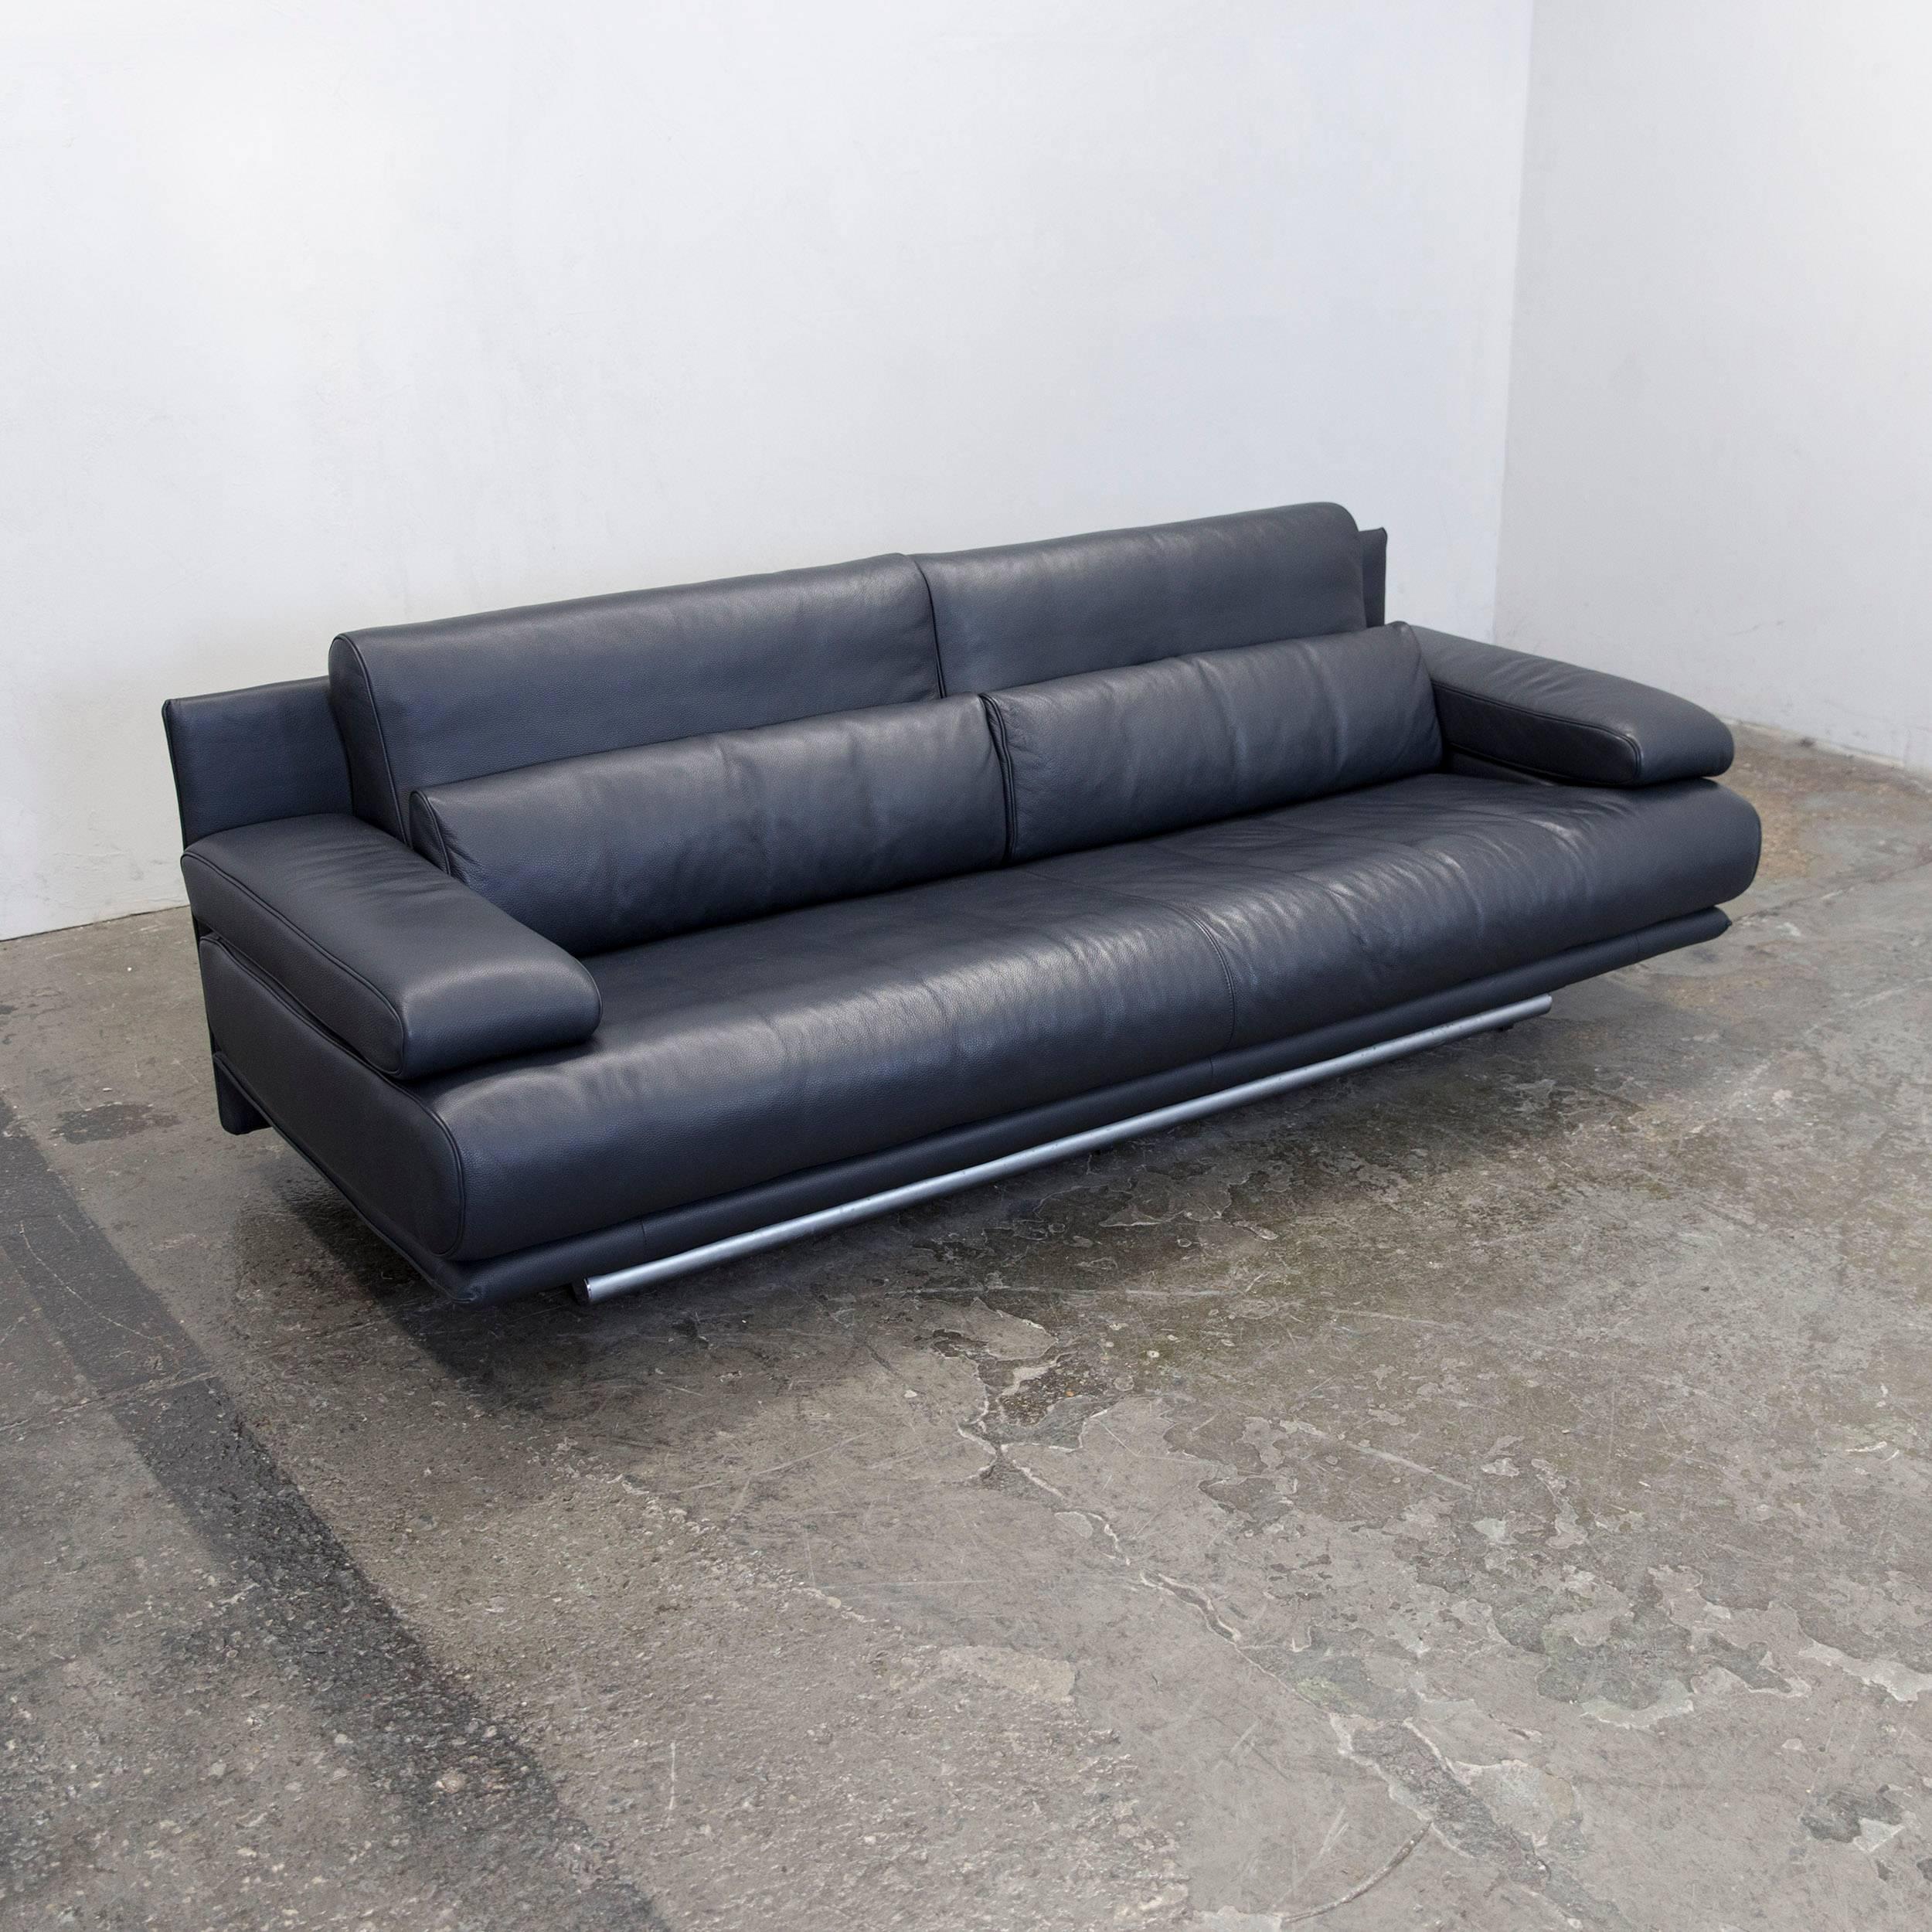 polstermbel aus leder gallery of fabulous sofas. Black Bedroom Furniture Sets. Home Design Ideas